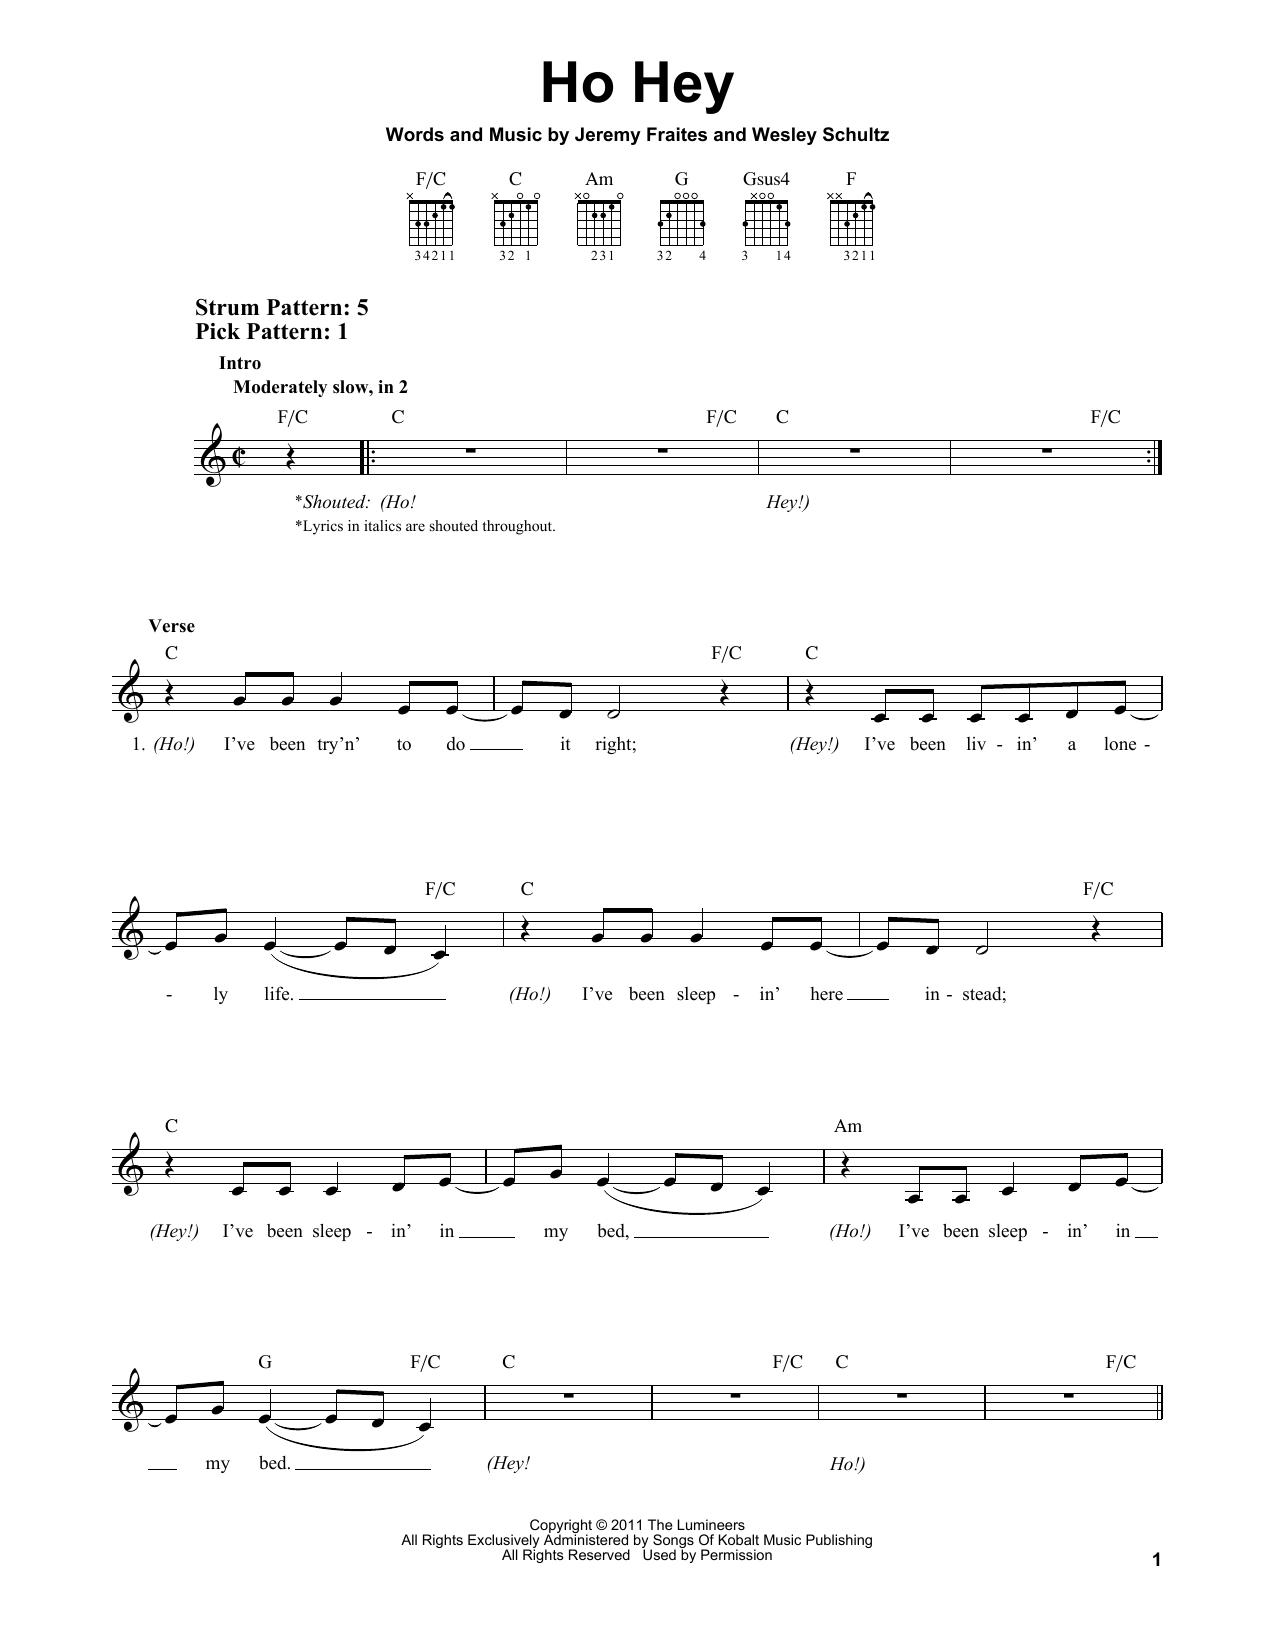 Ho Hey Chords The Lumineers Ho Hey Sheet Music Notes Chords Download Printable Easy Guitar Sku 156335